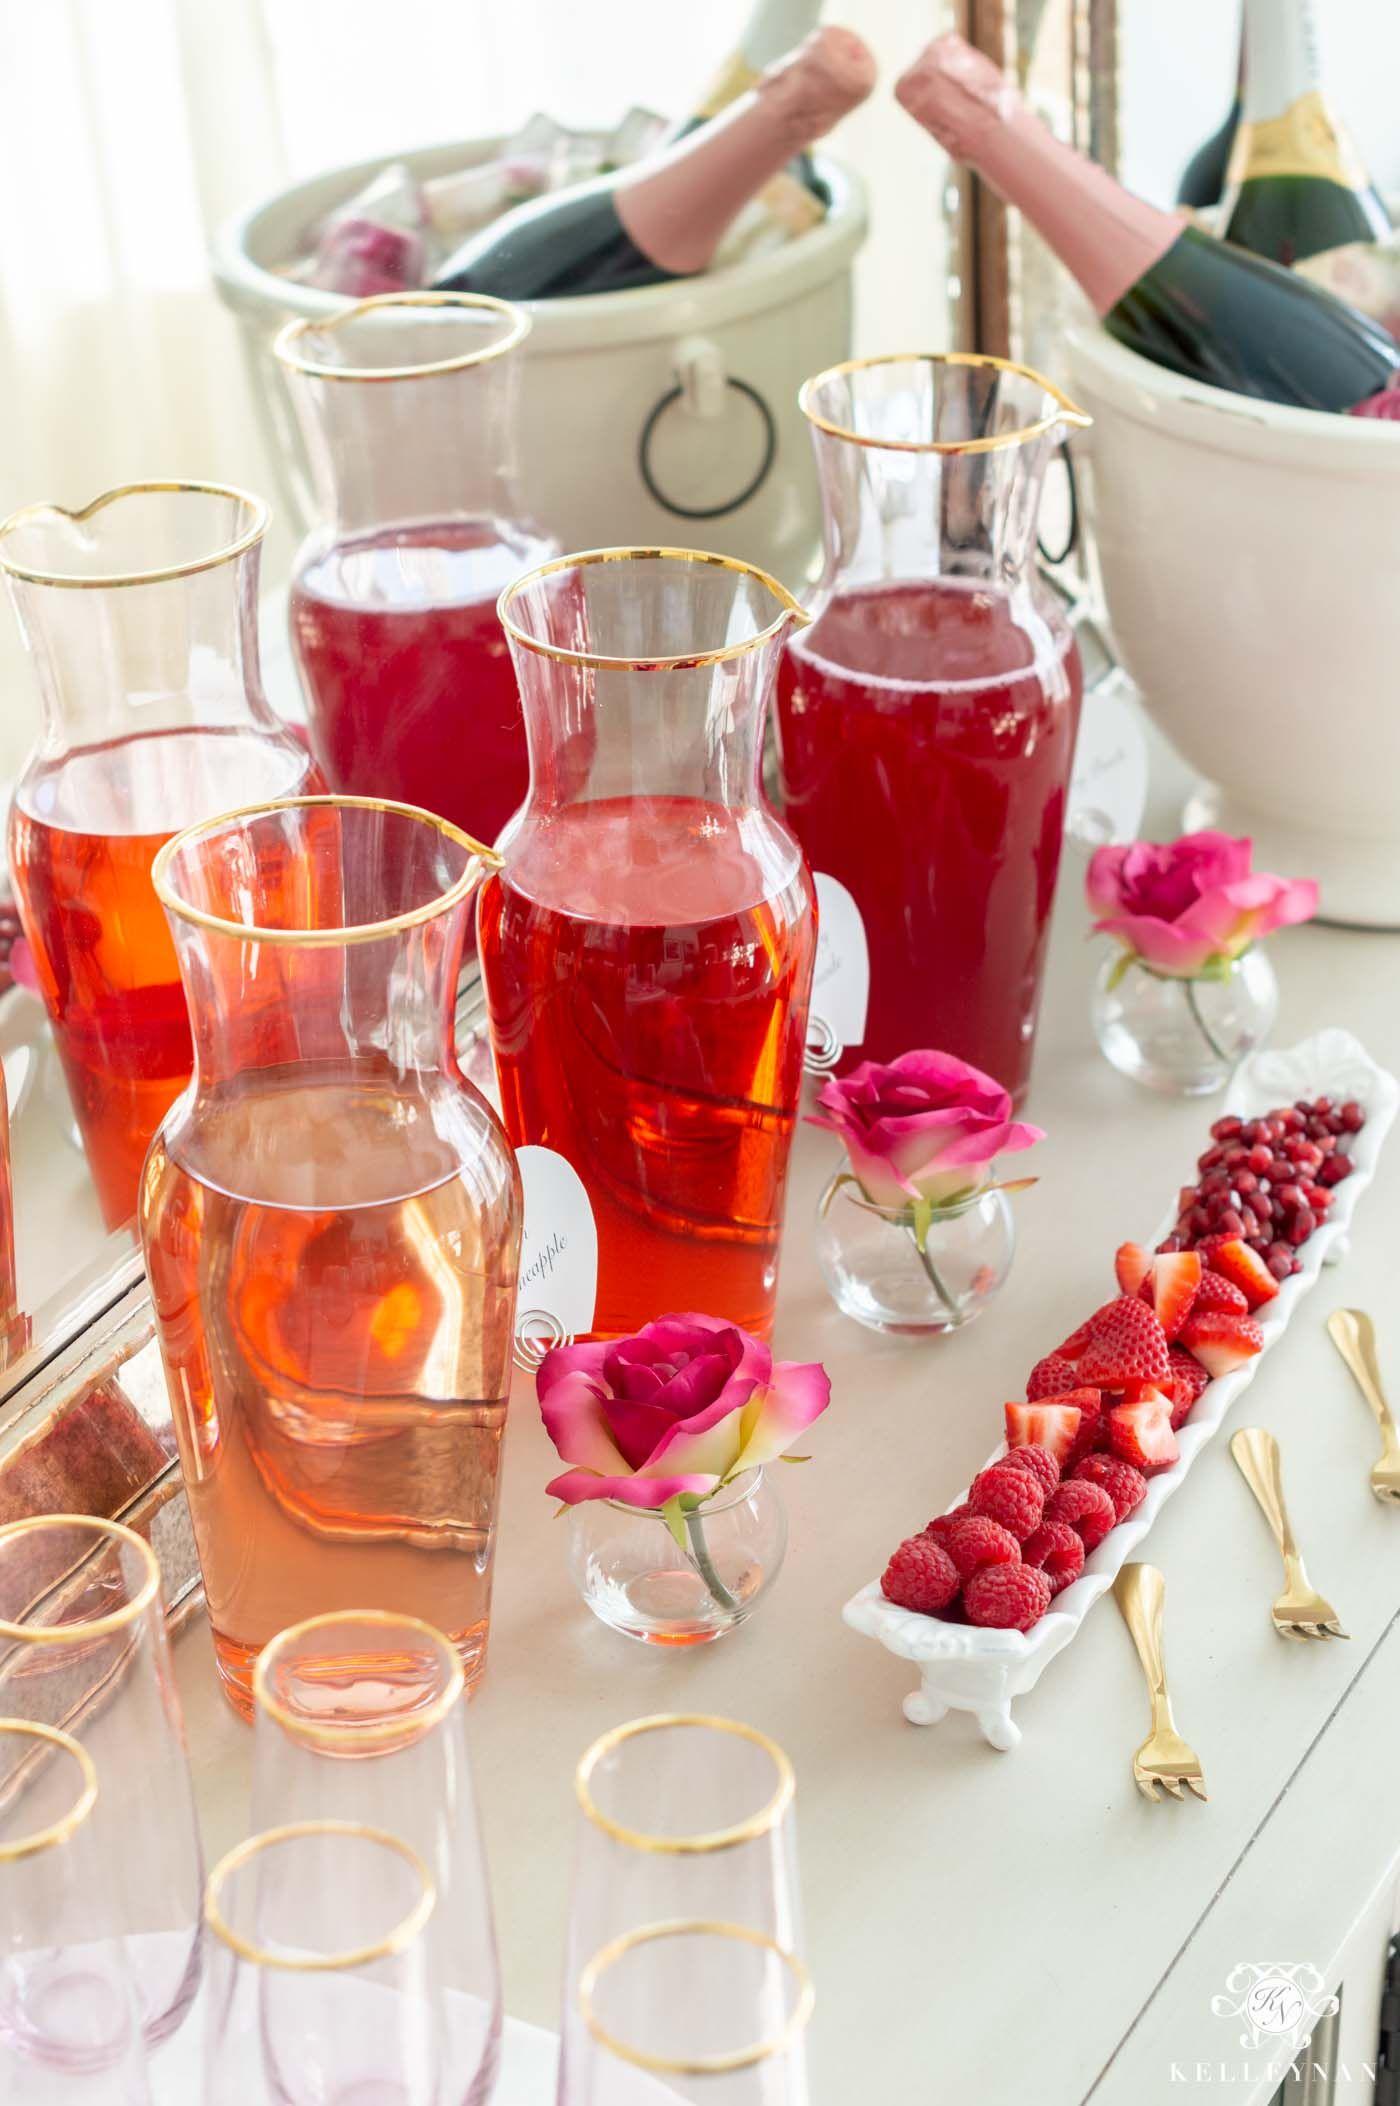 Mimosa Bar Ideas Sweetheart Setup Theme Kelley Nan In 2020 Mimosa Bar Mimosa Stemless Champagne Flutes